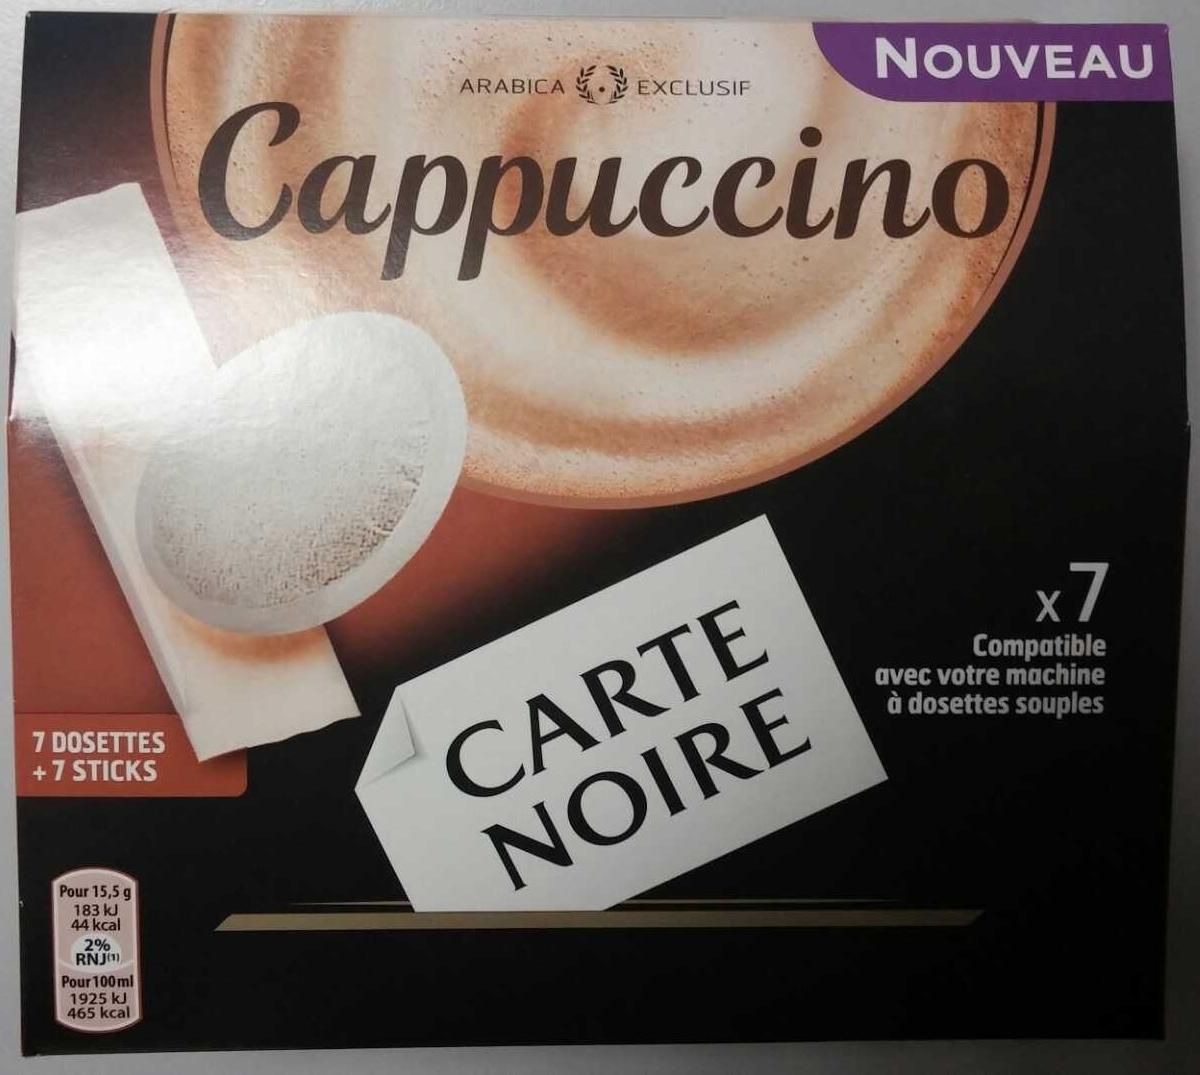 cappuccino carte noire 108 5 g. Black Bedroom Furniture Sets. Home Design Ideas